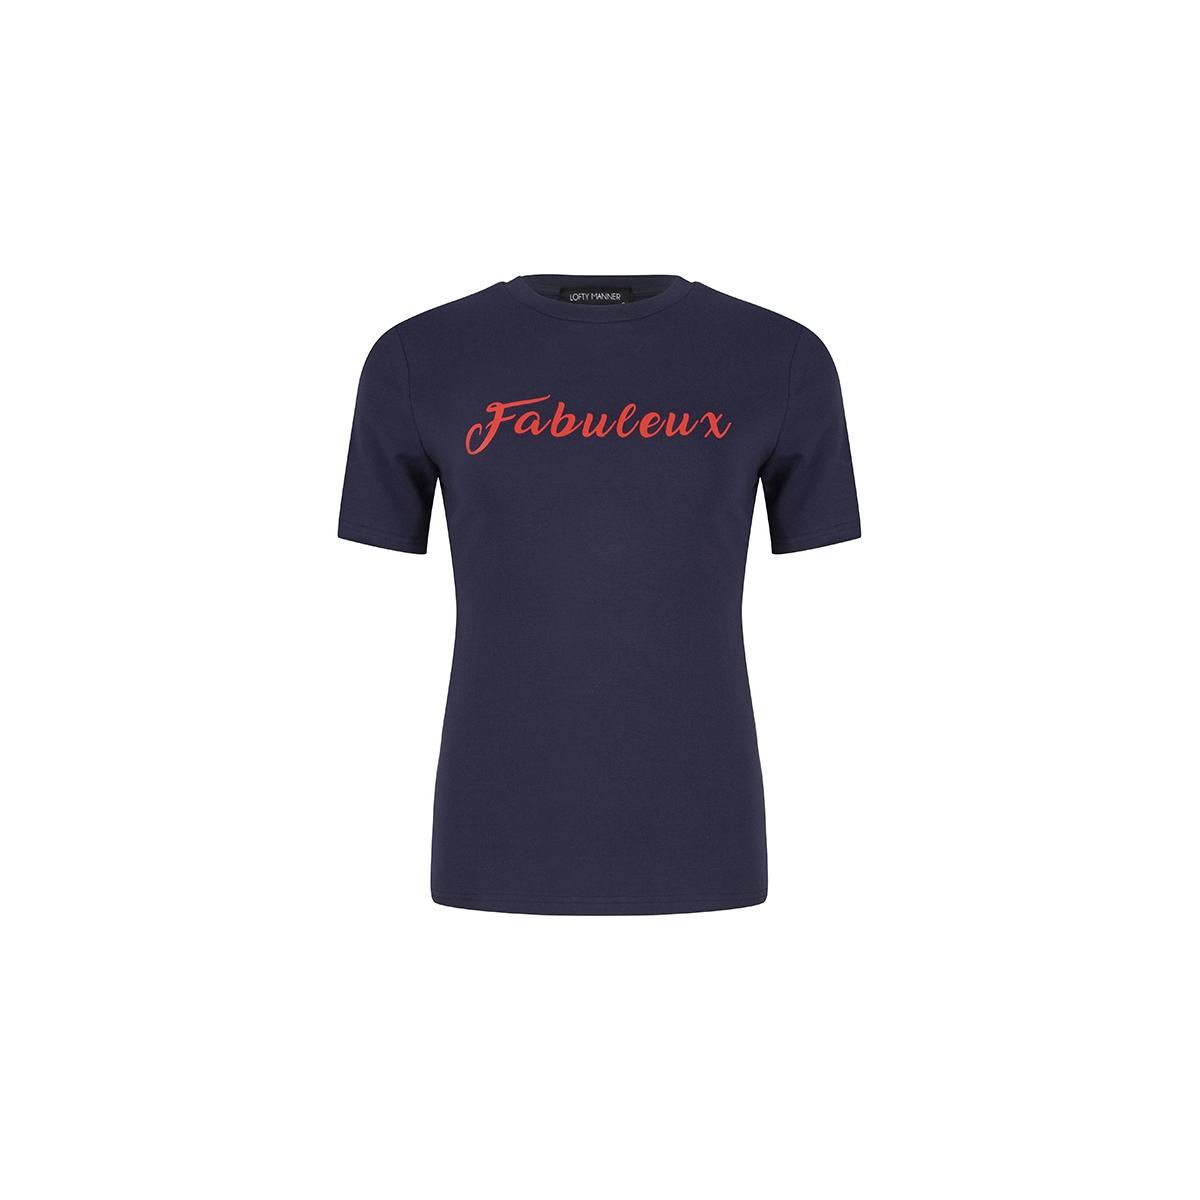 mf55 tee rivee lofty manner t-shirt blue